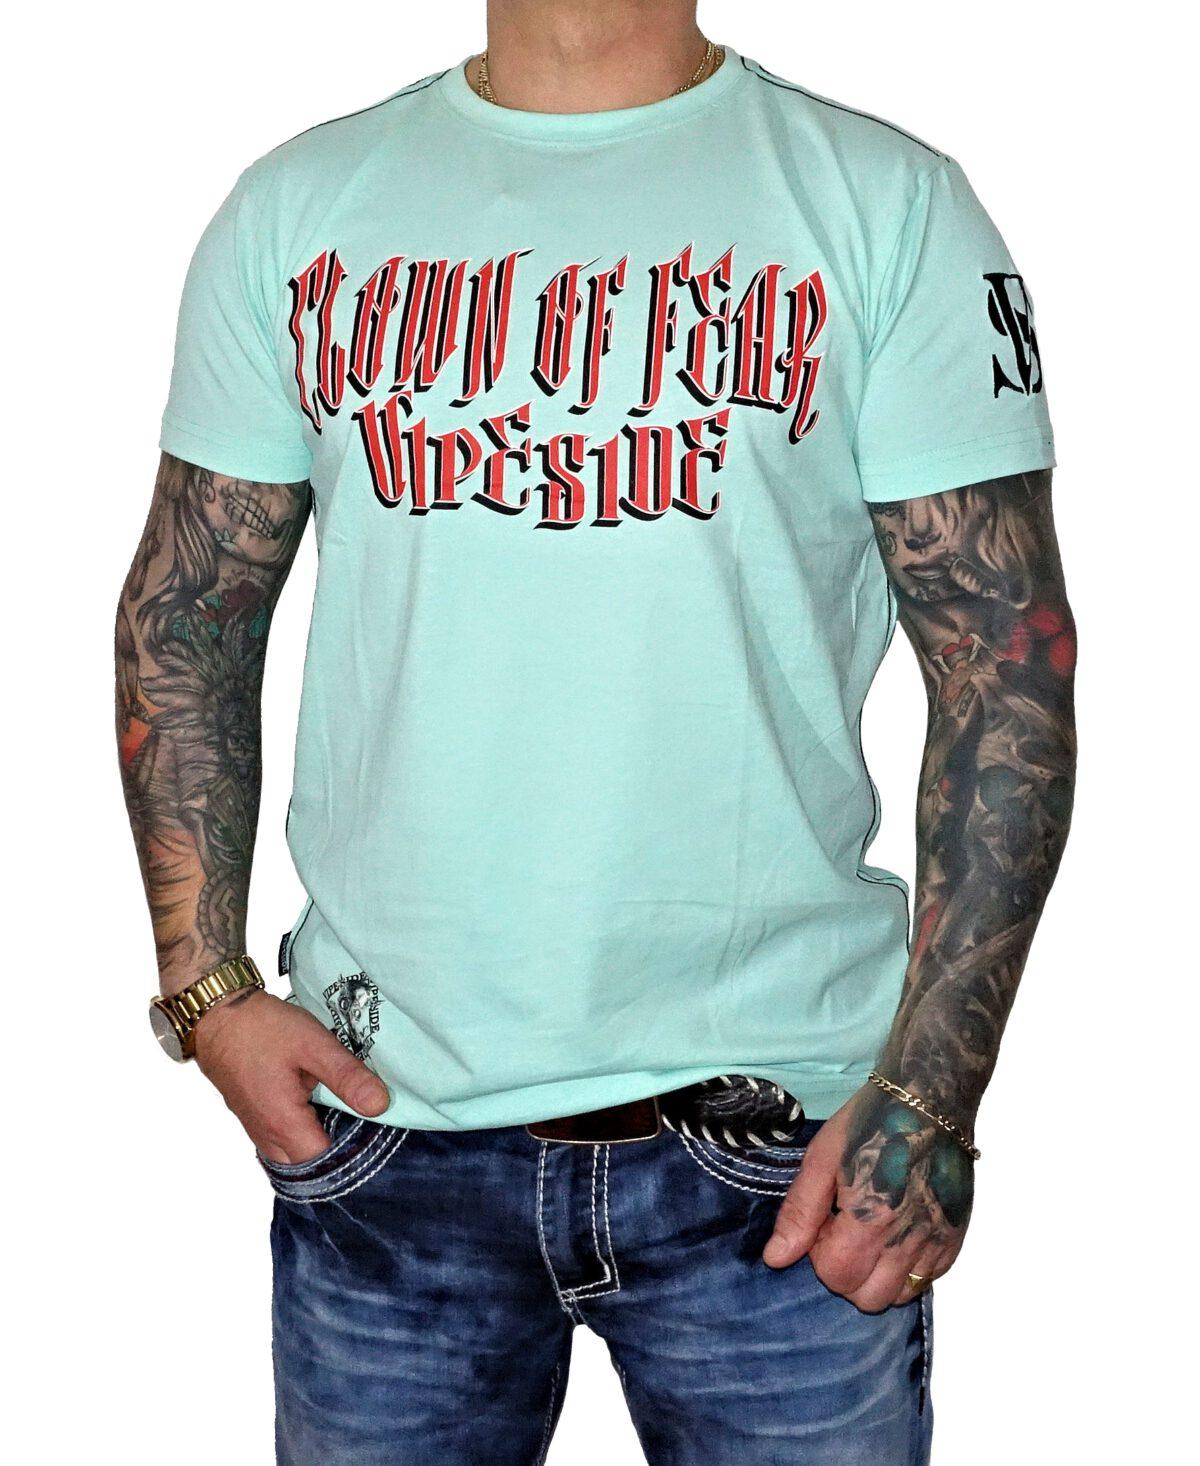 "Vipeside T-Shirt ""Clown of Fear"" TS-24 mint grün"